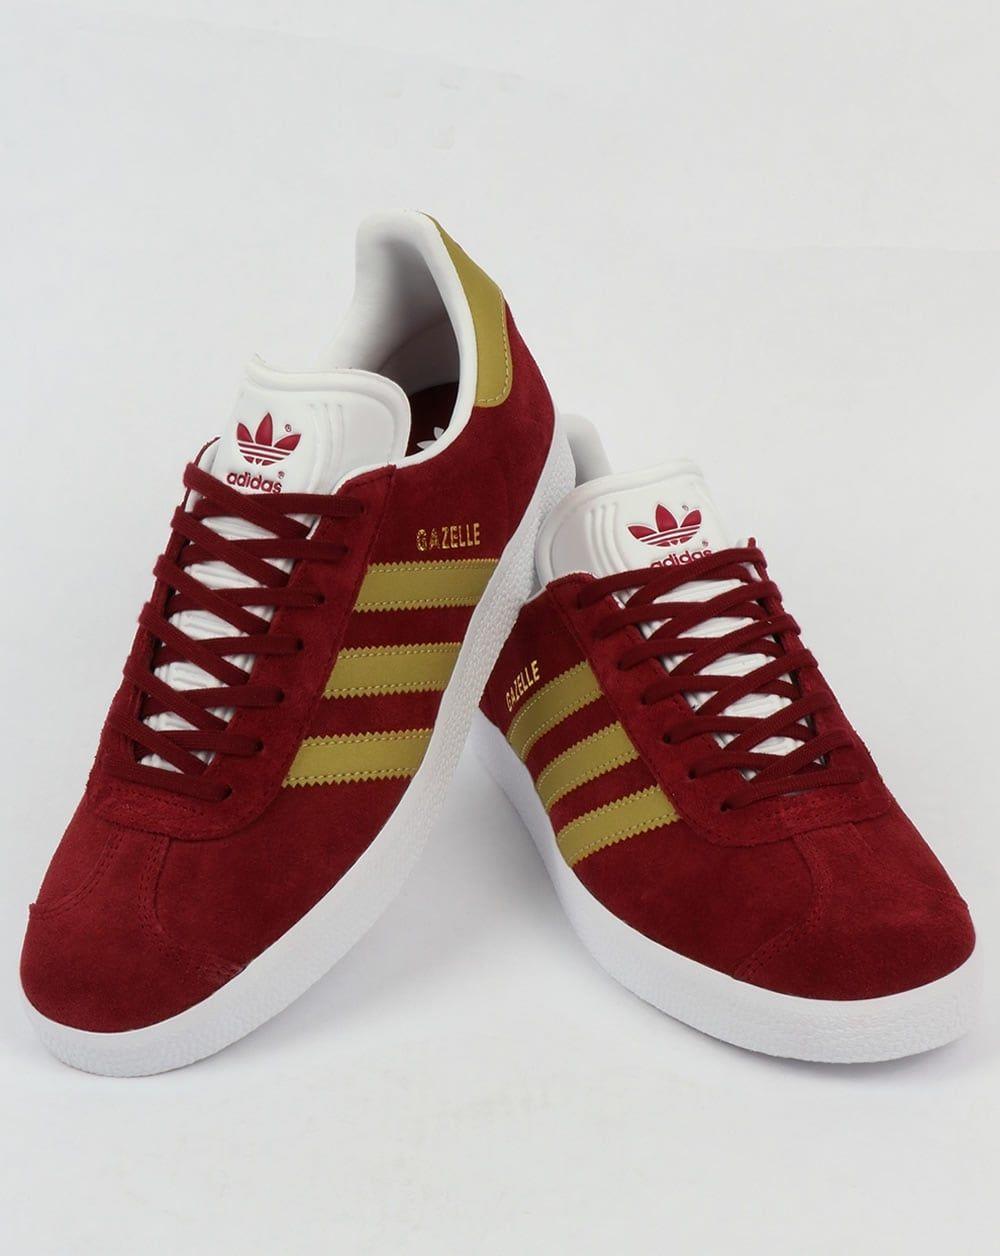 Adidas Gazelle Trainers Burgundy/Gold